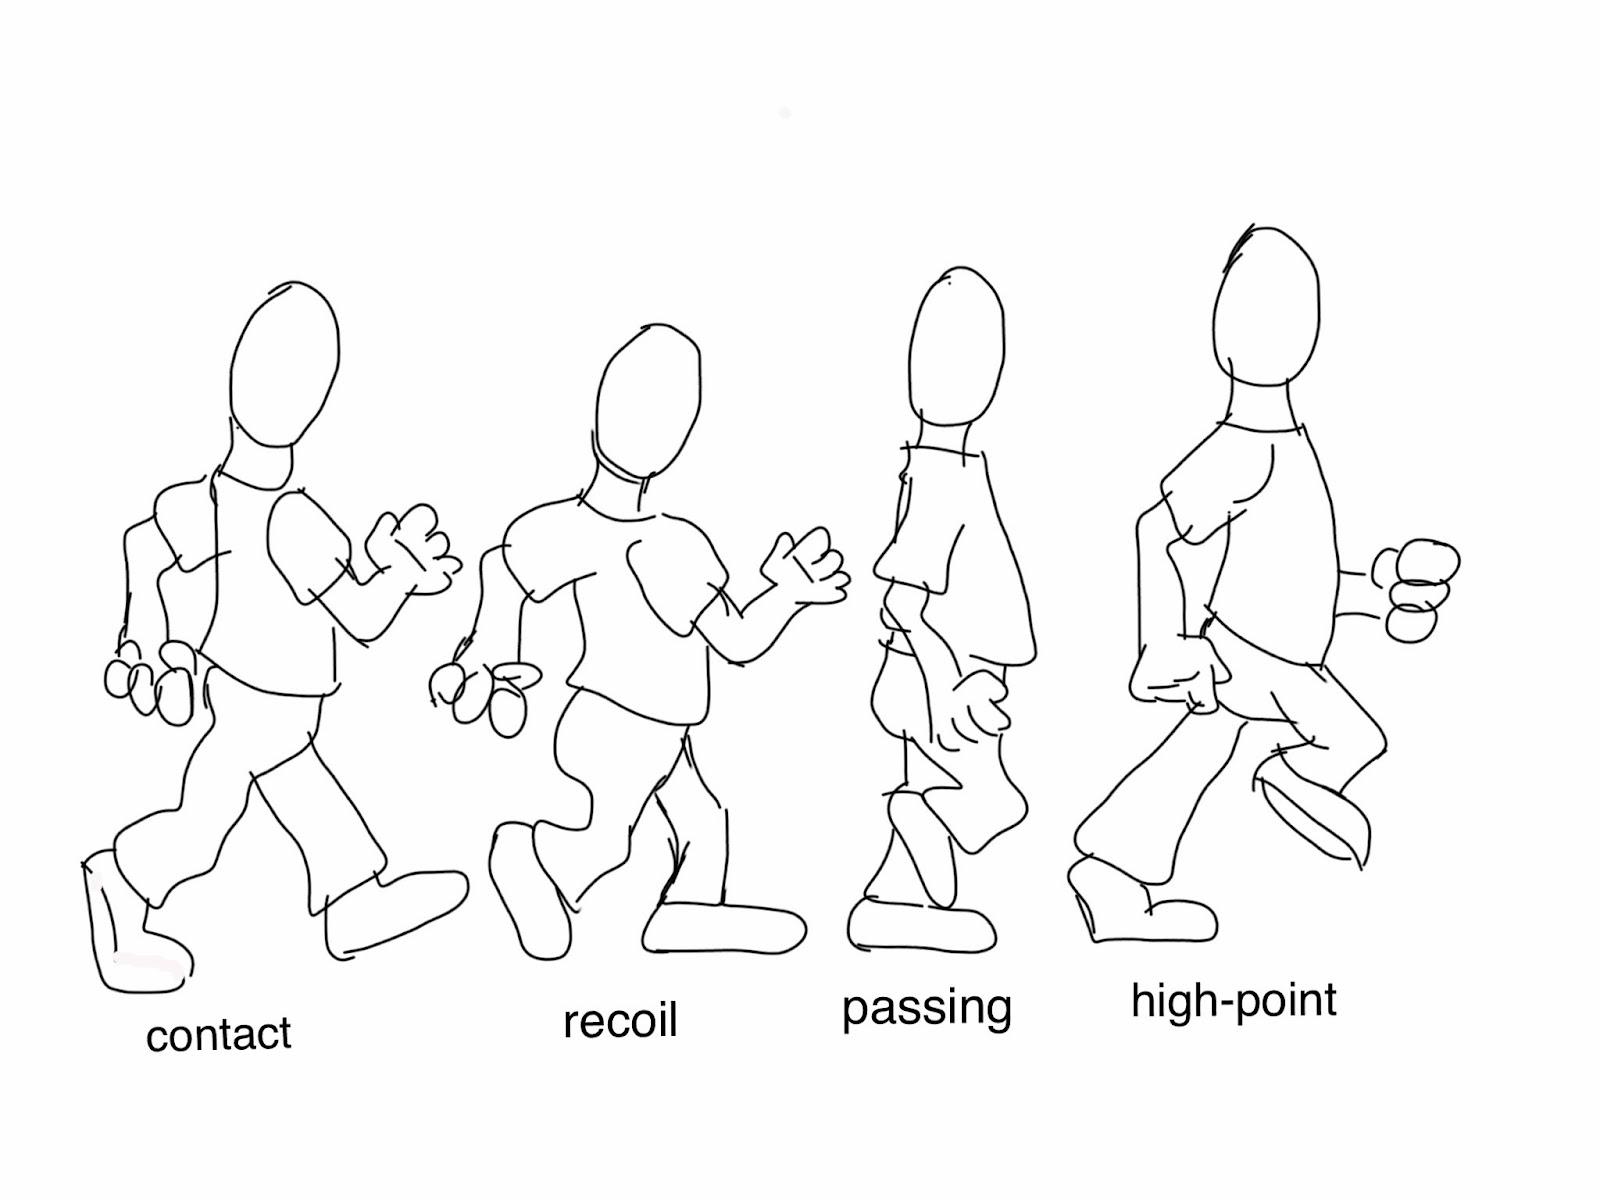 1600x1200 The Helpful Art Teacher Cartooning And Animation 101 The Walk Cycle